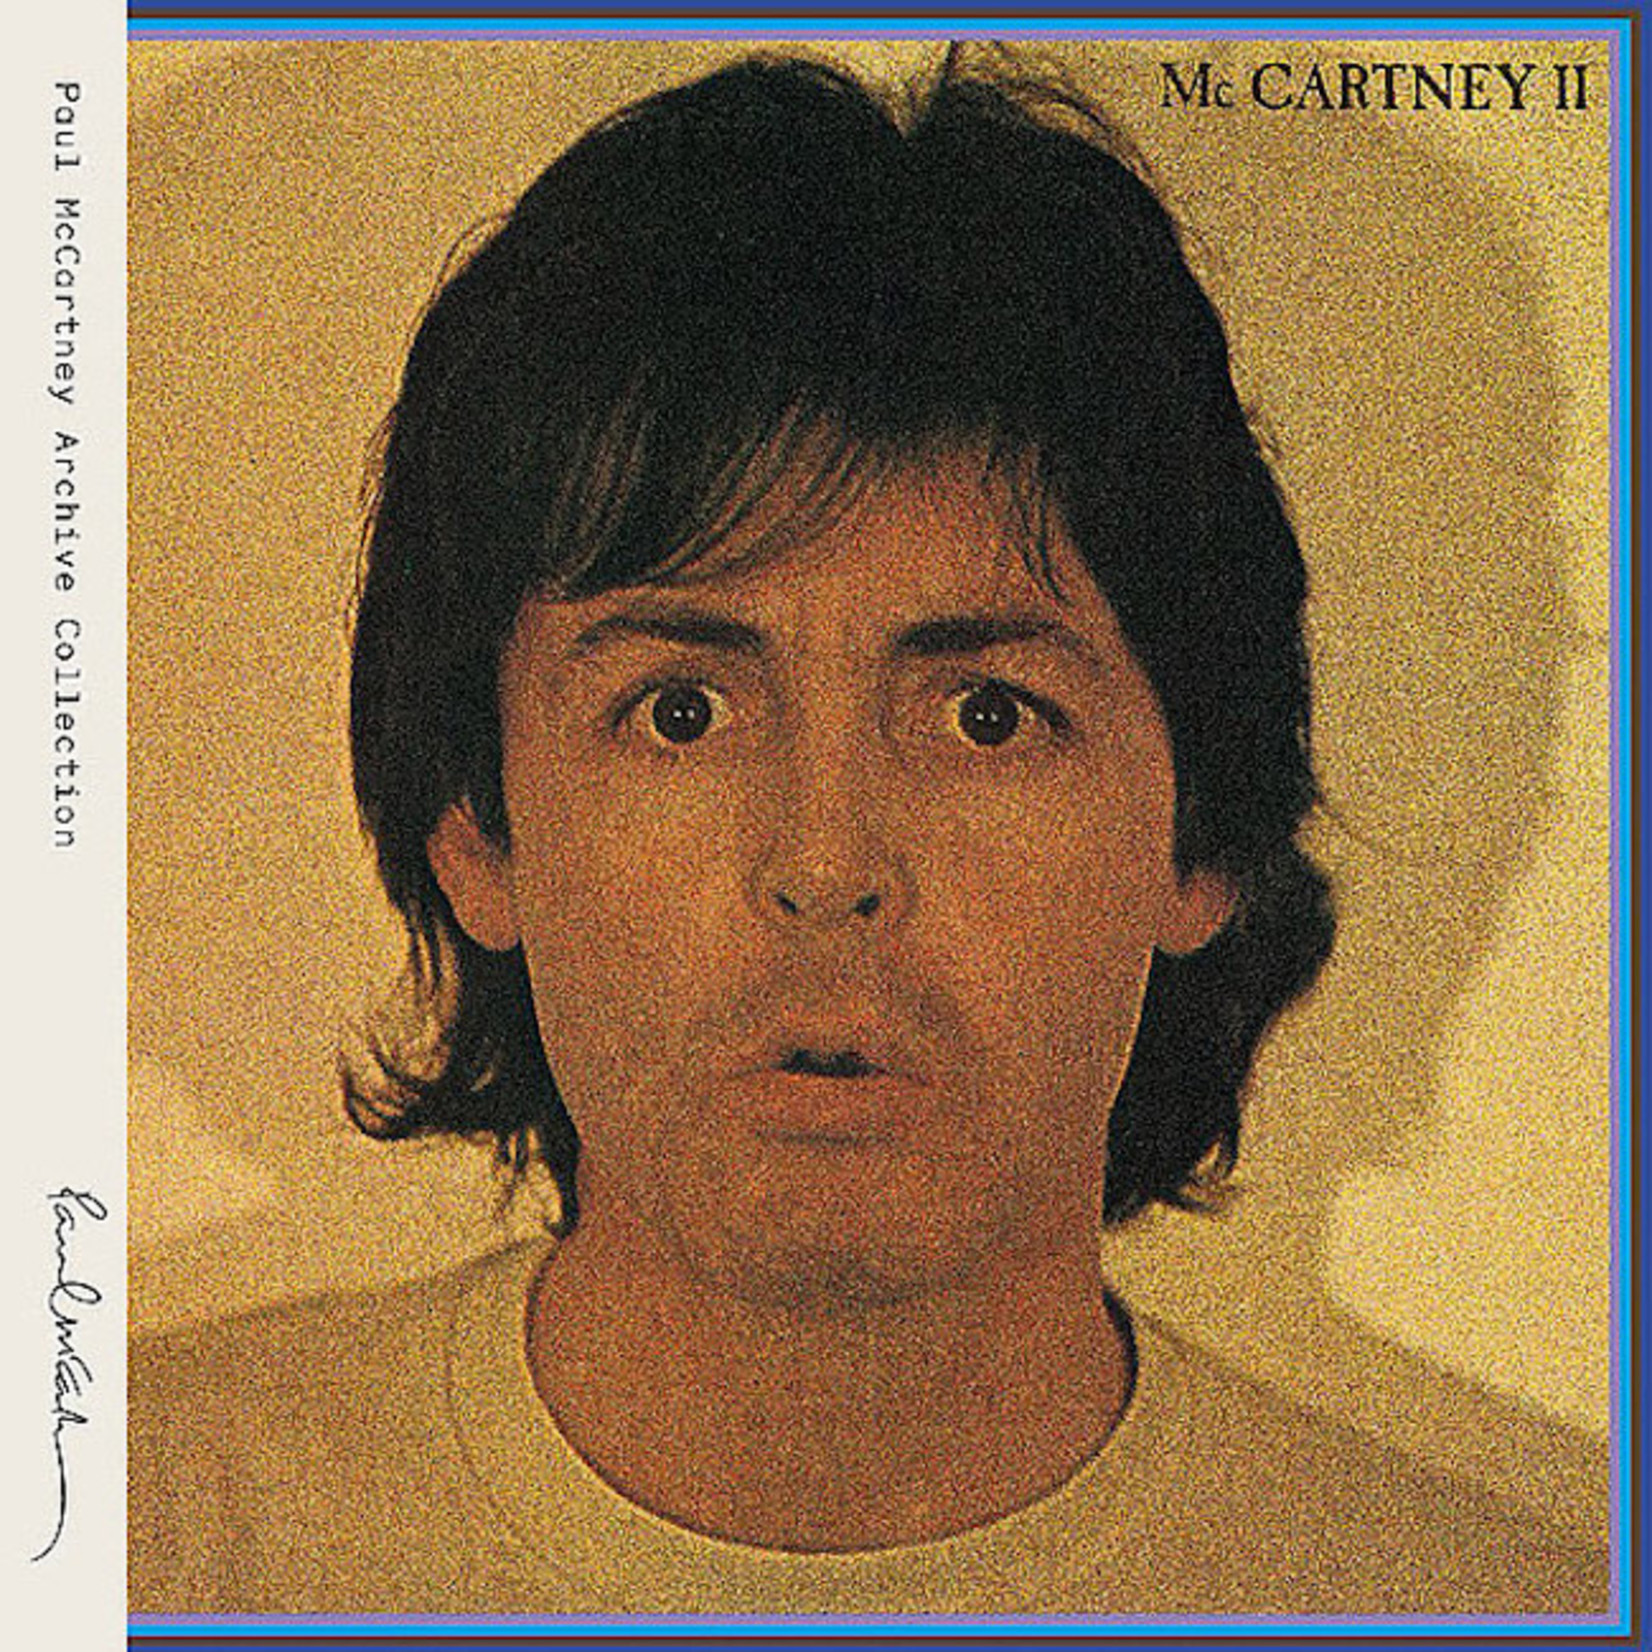 [Vintage] McCartney, Paul (Beatles): McCartney II